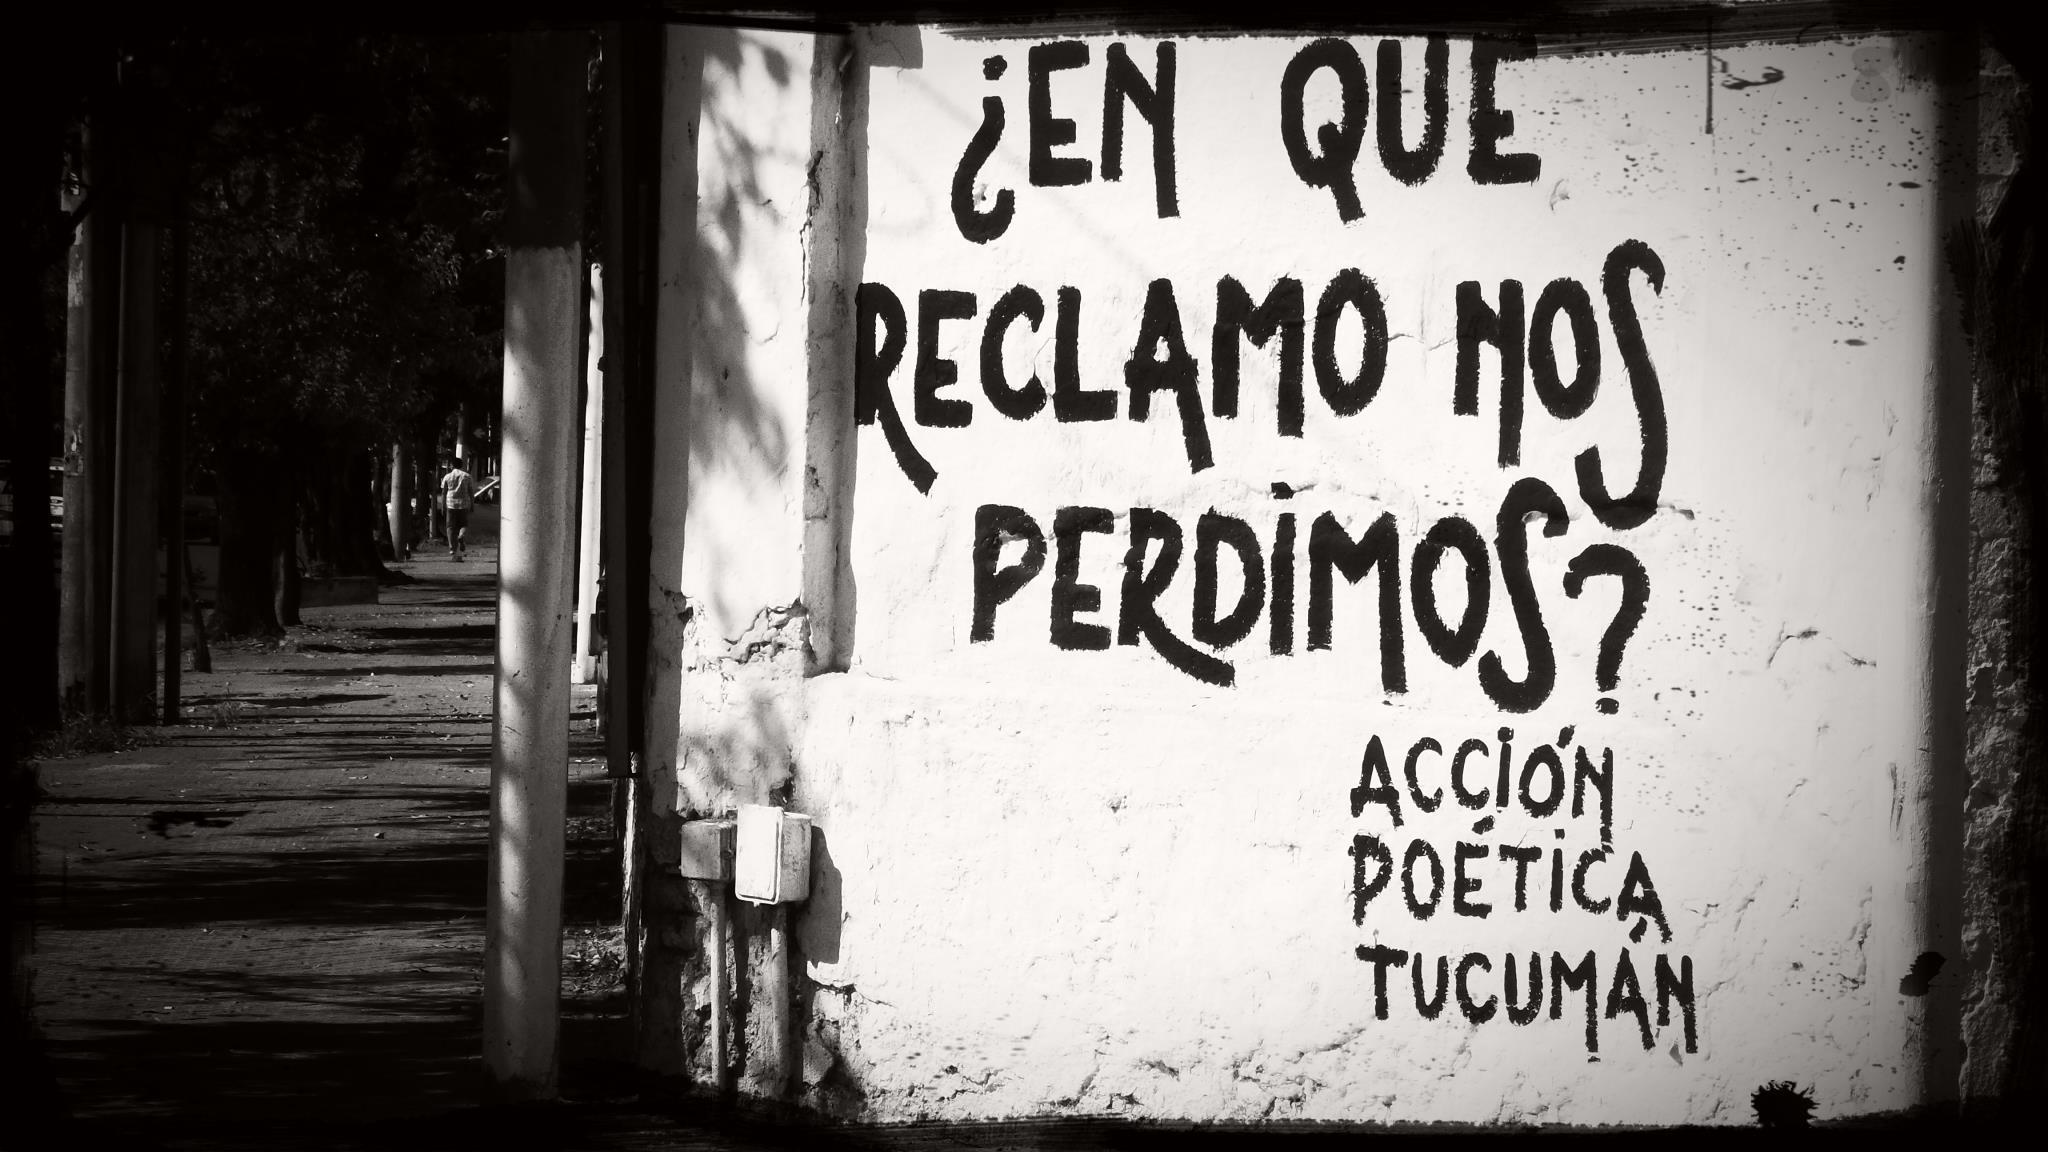 EnQue_reclamo_nos_perdimos